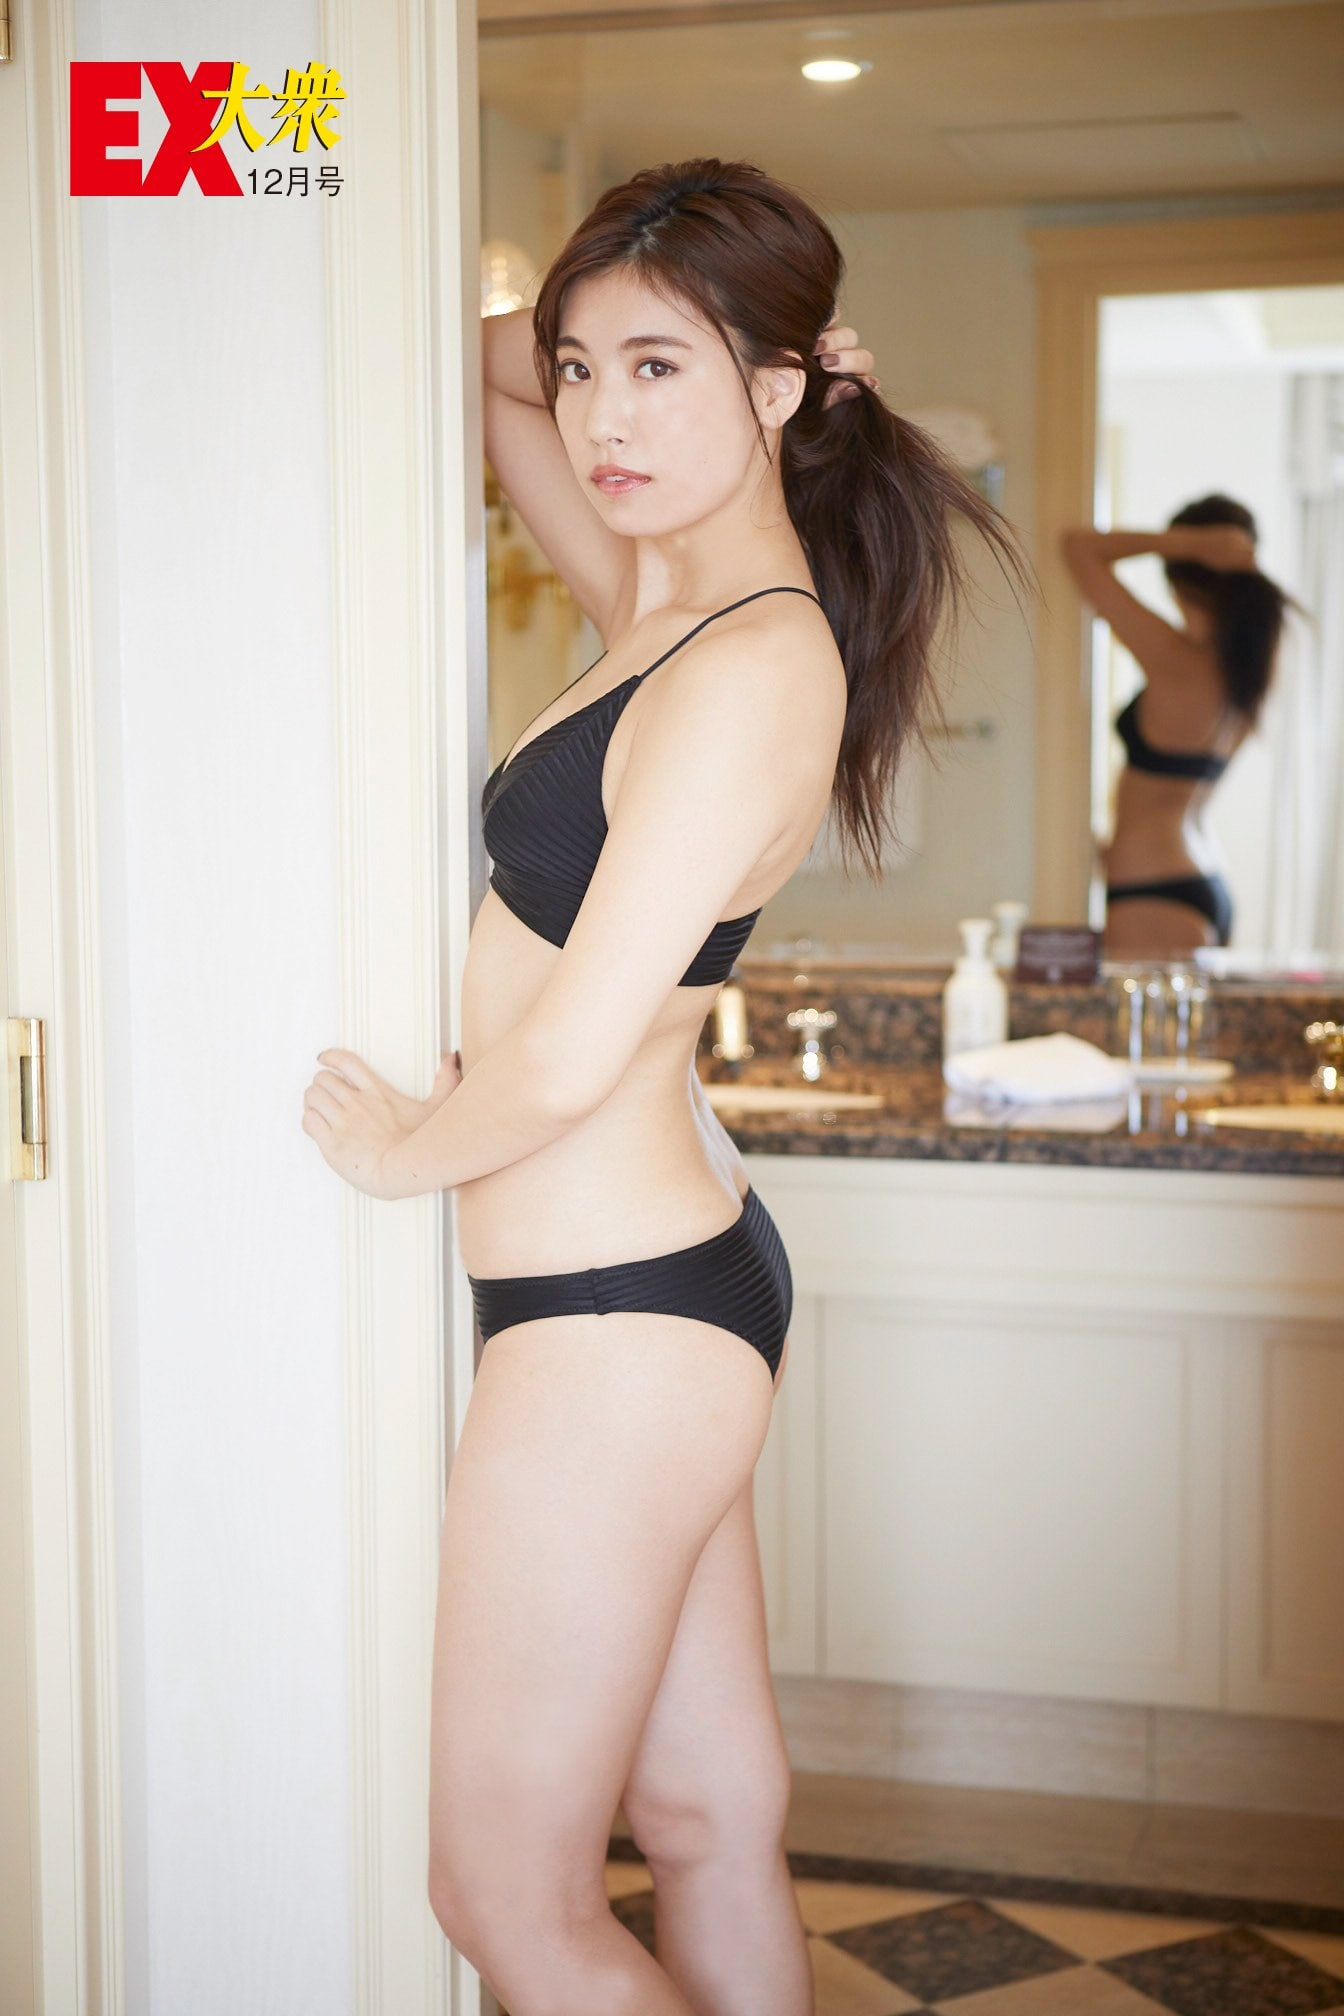 SKE48荒井優希の本誌未掲載カット6枚を大公開!【EX大衆12月号】の画像001